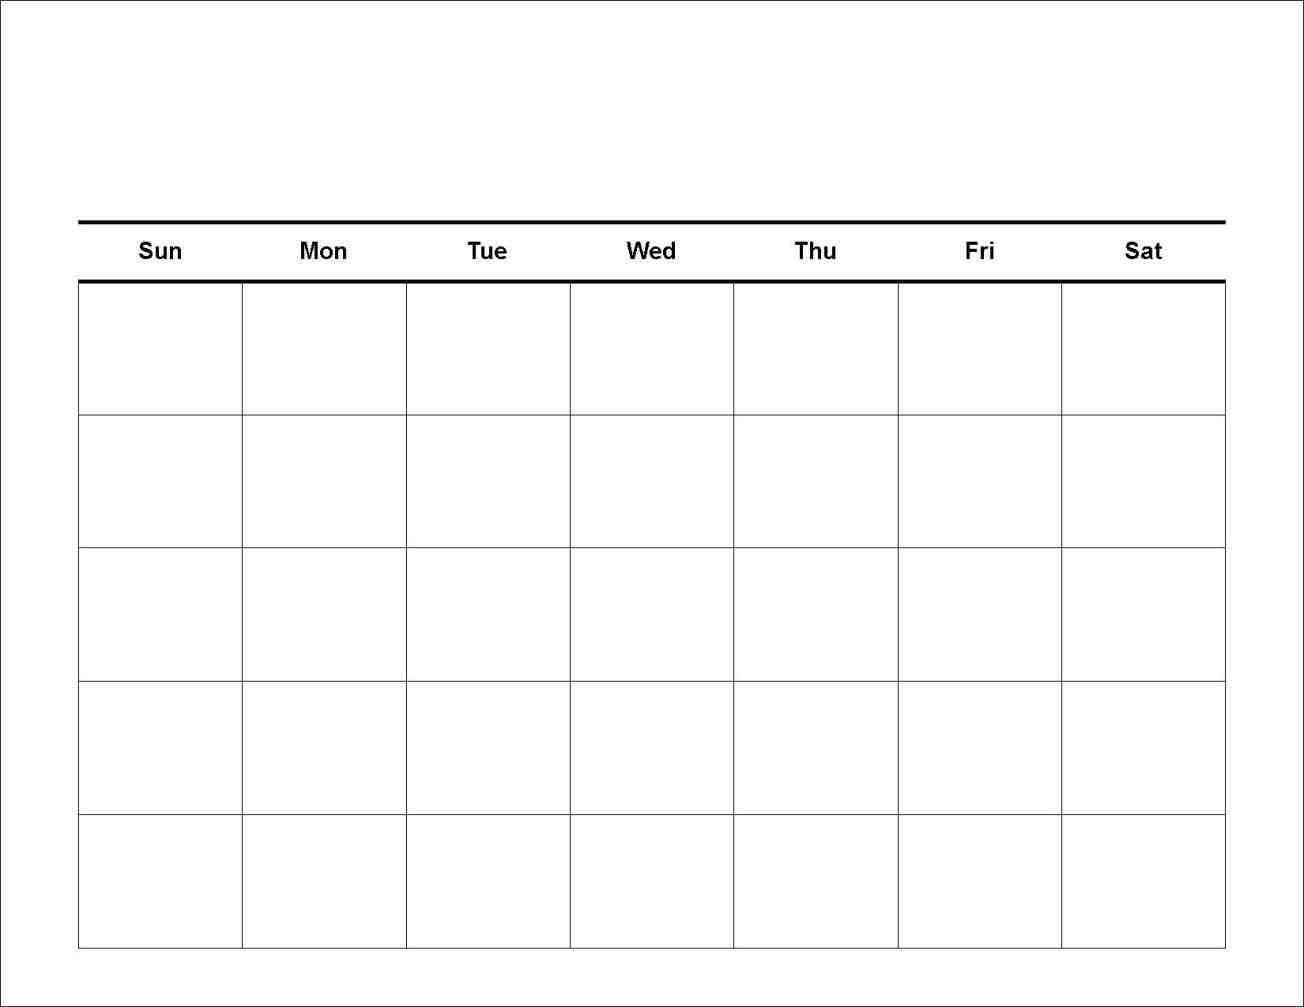 Free 7 Day Blank Calendar | Igotlockedout for Blank 7 Day Week Calendar